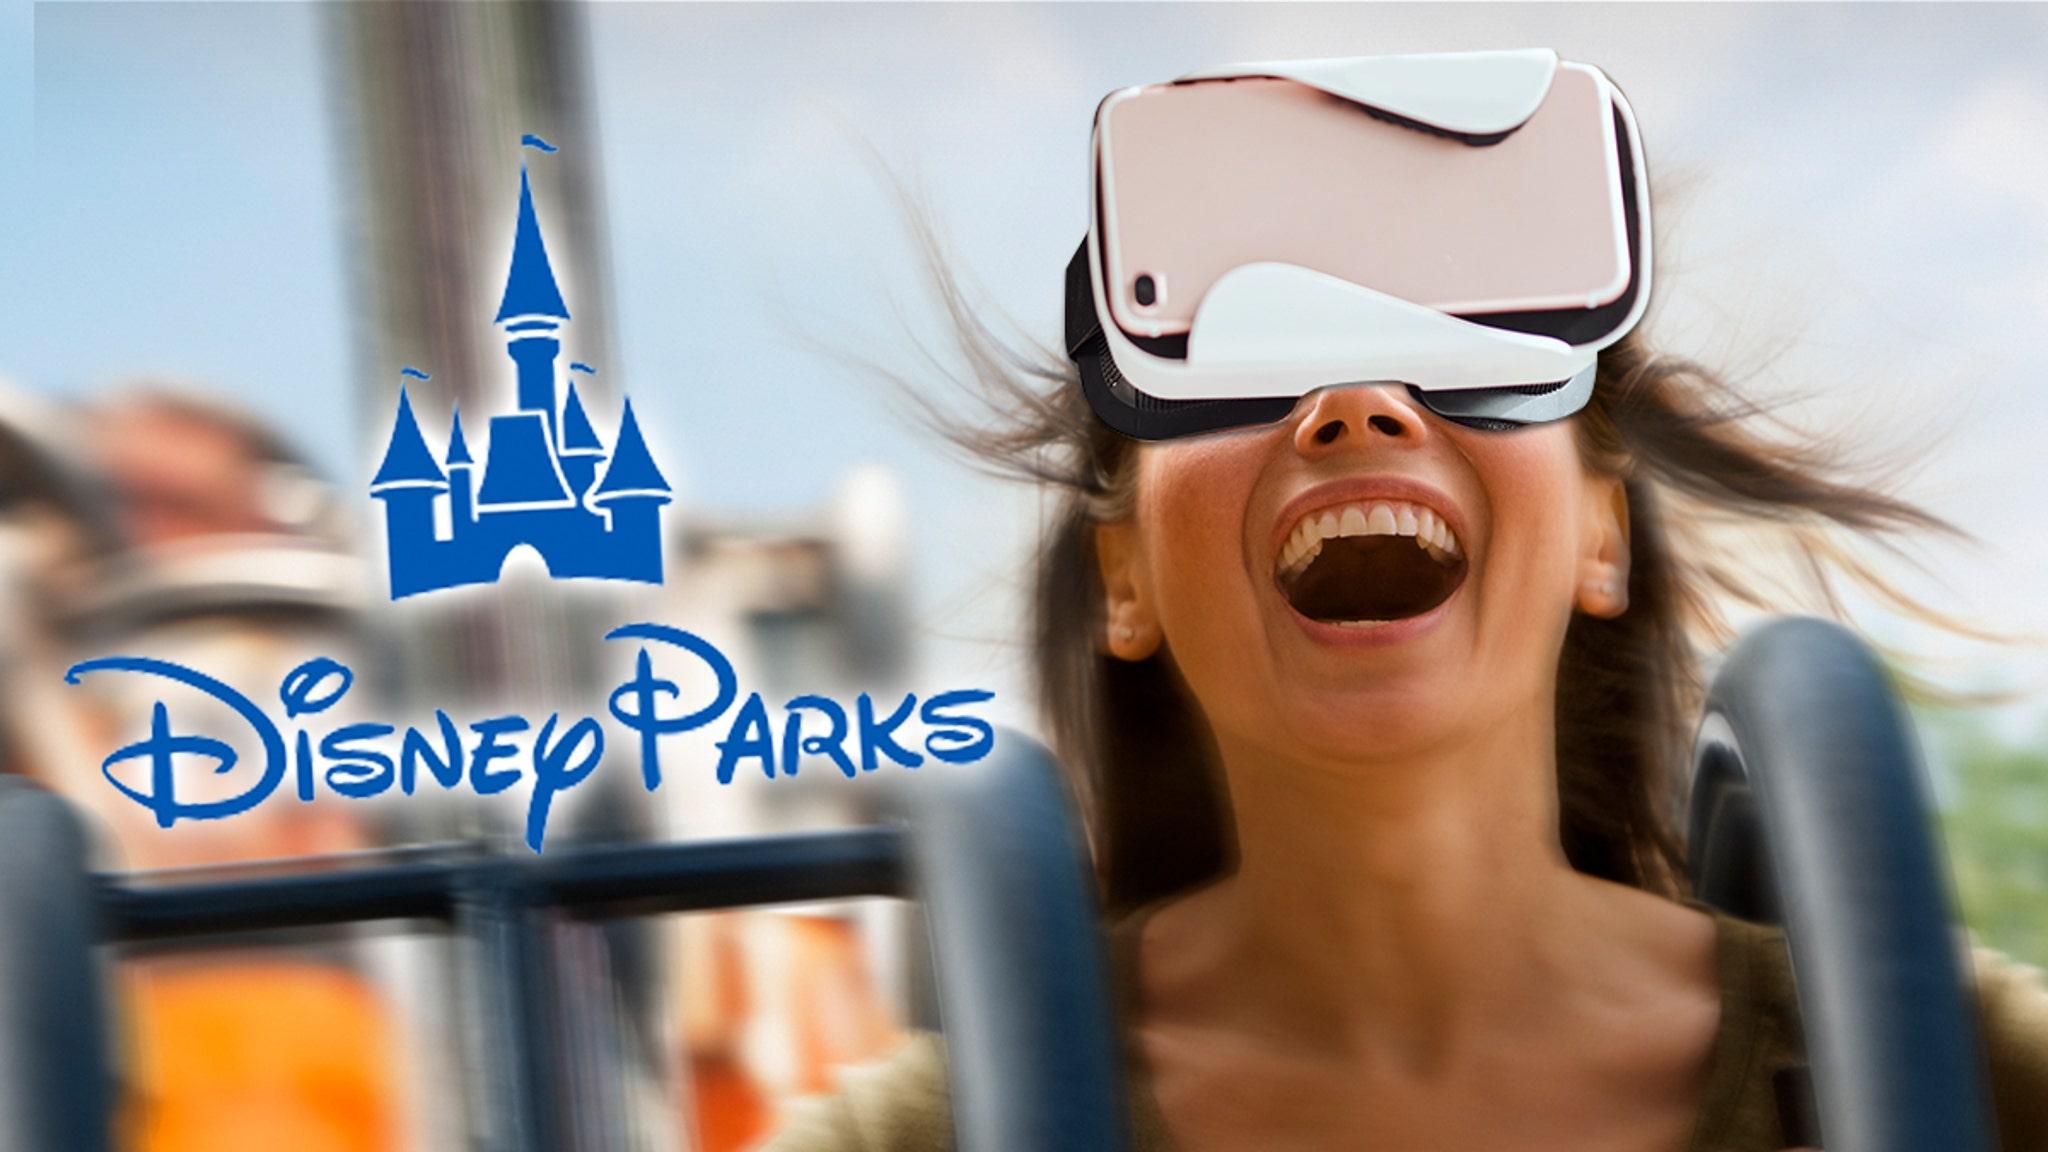 Disney Theme Park Rides Available via Virtual Reality YouTube Channel